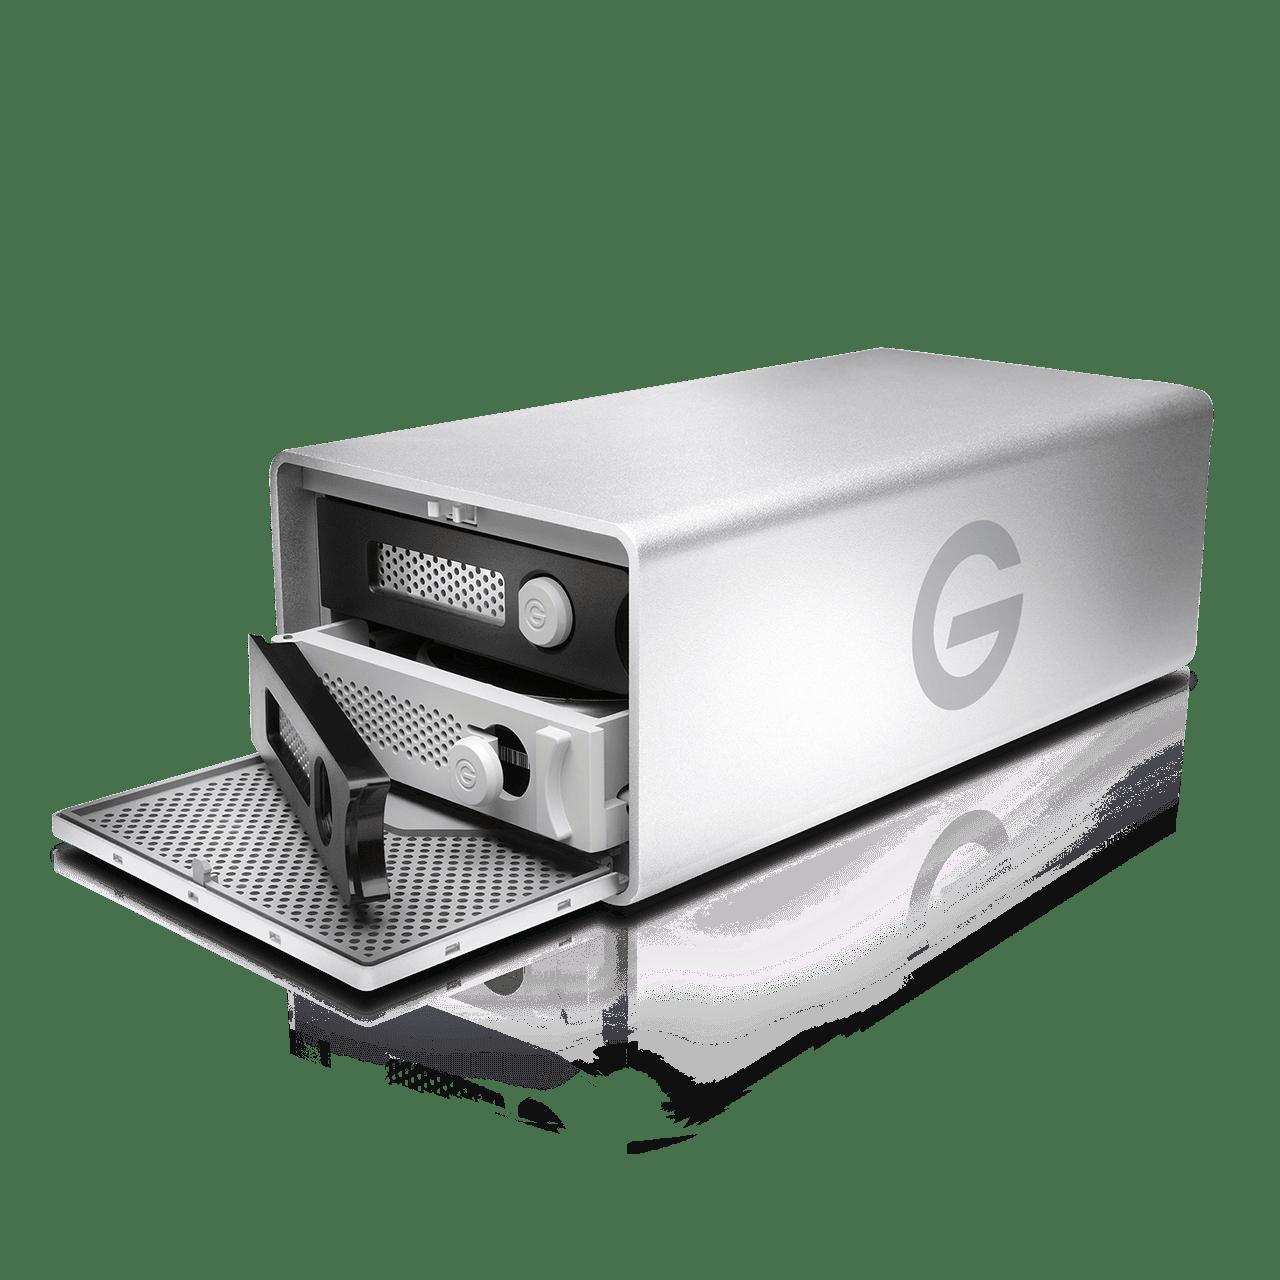 g-raid-thunderbolt-3-removable-hero2-open-png-thumb-1280-1280